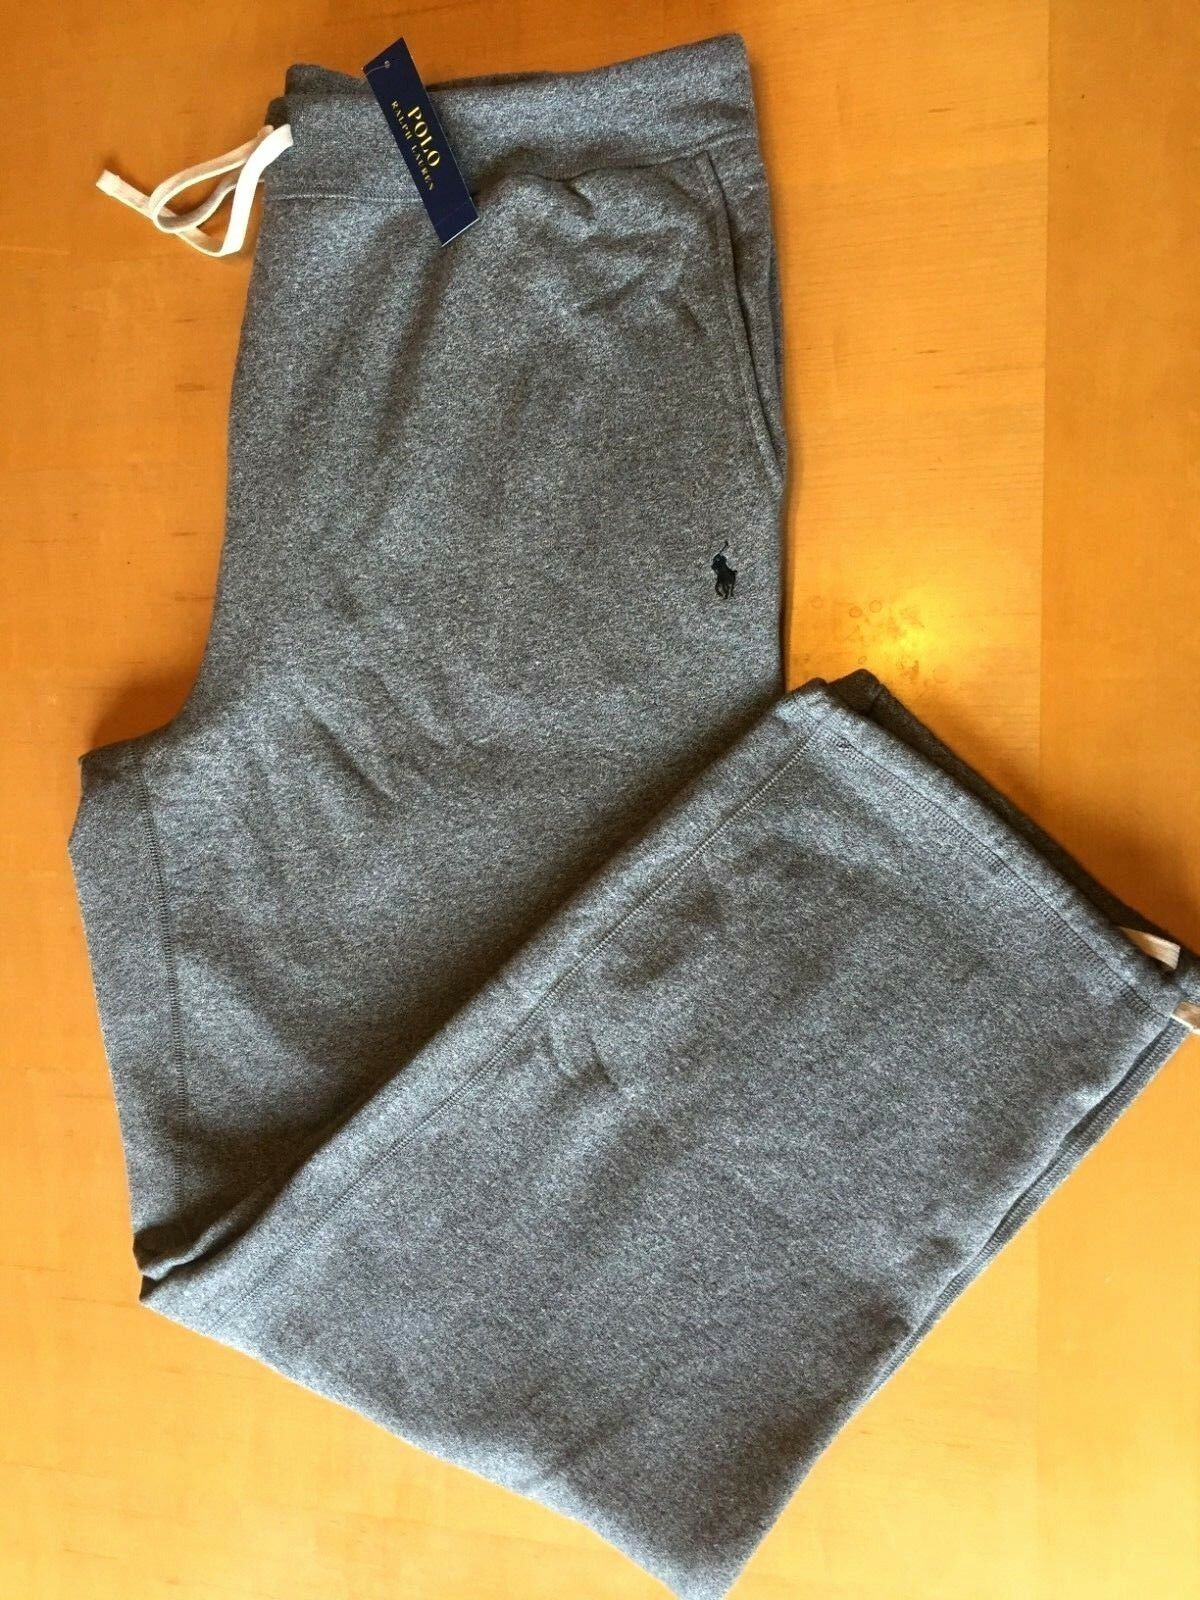 NWT  Herren Polo Ralph Lauren Fleece Sweatpants Drawstring grau Größe 4XLT Orig 110